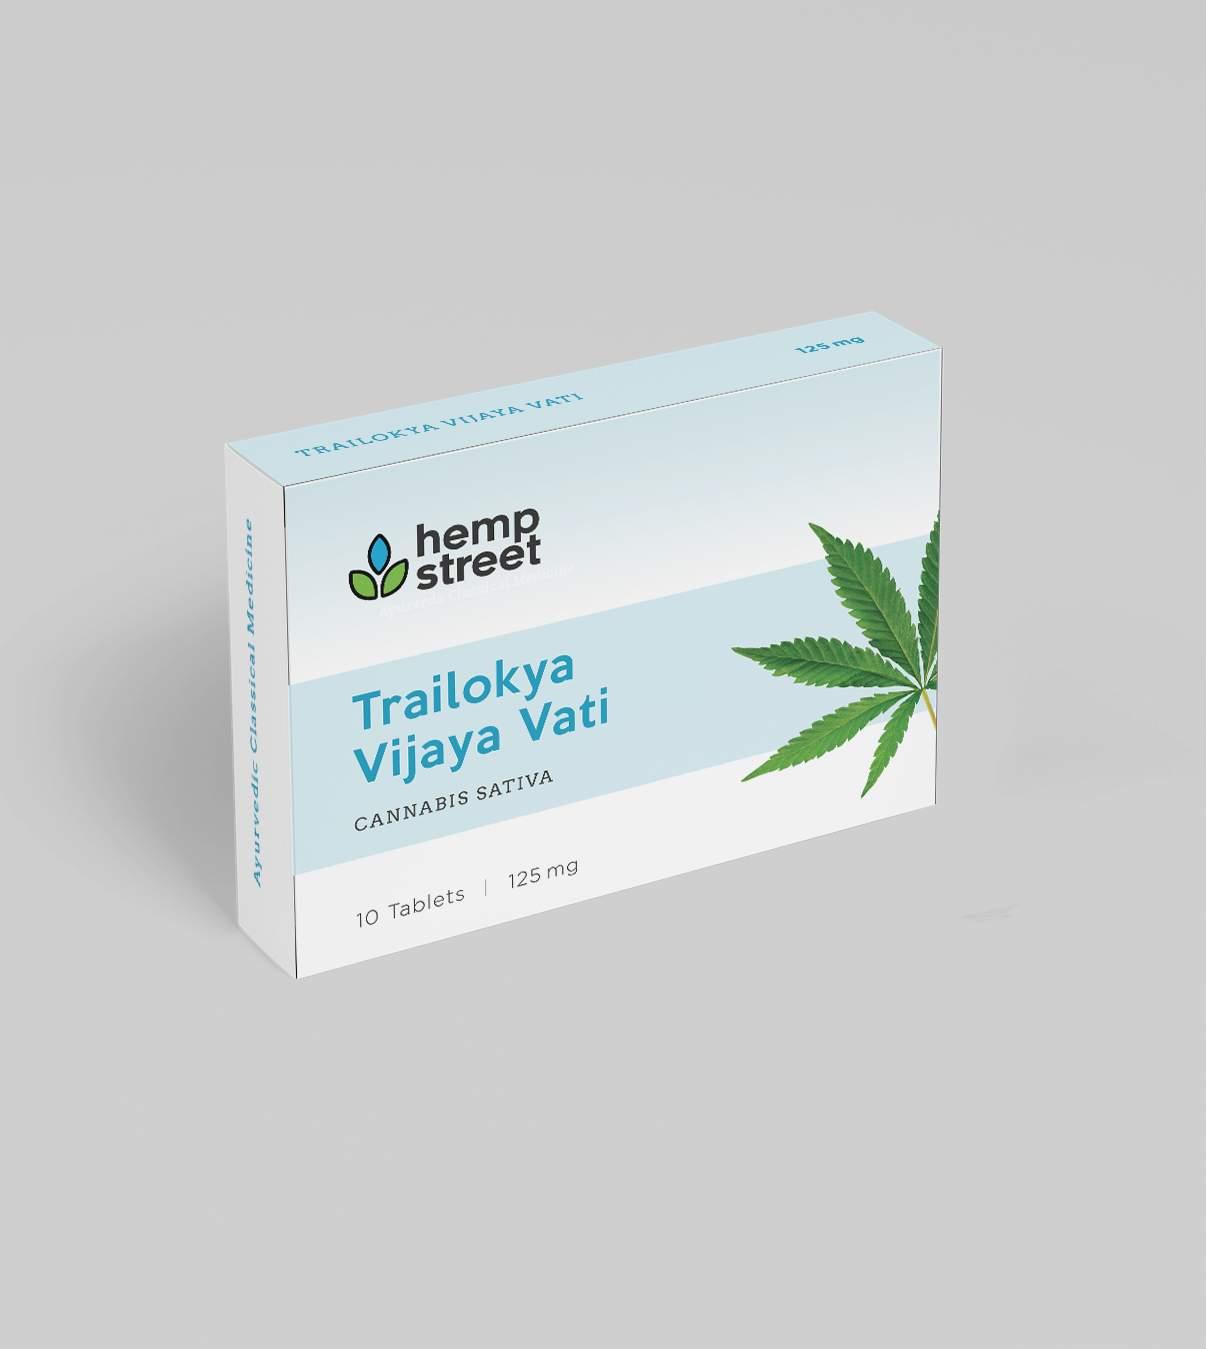 Trailokya Vijaya Vati